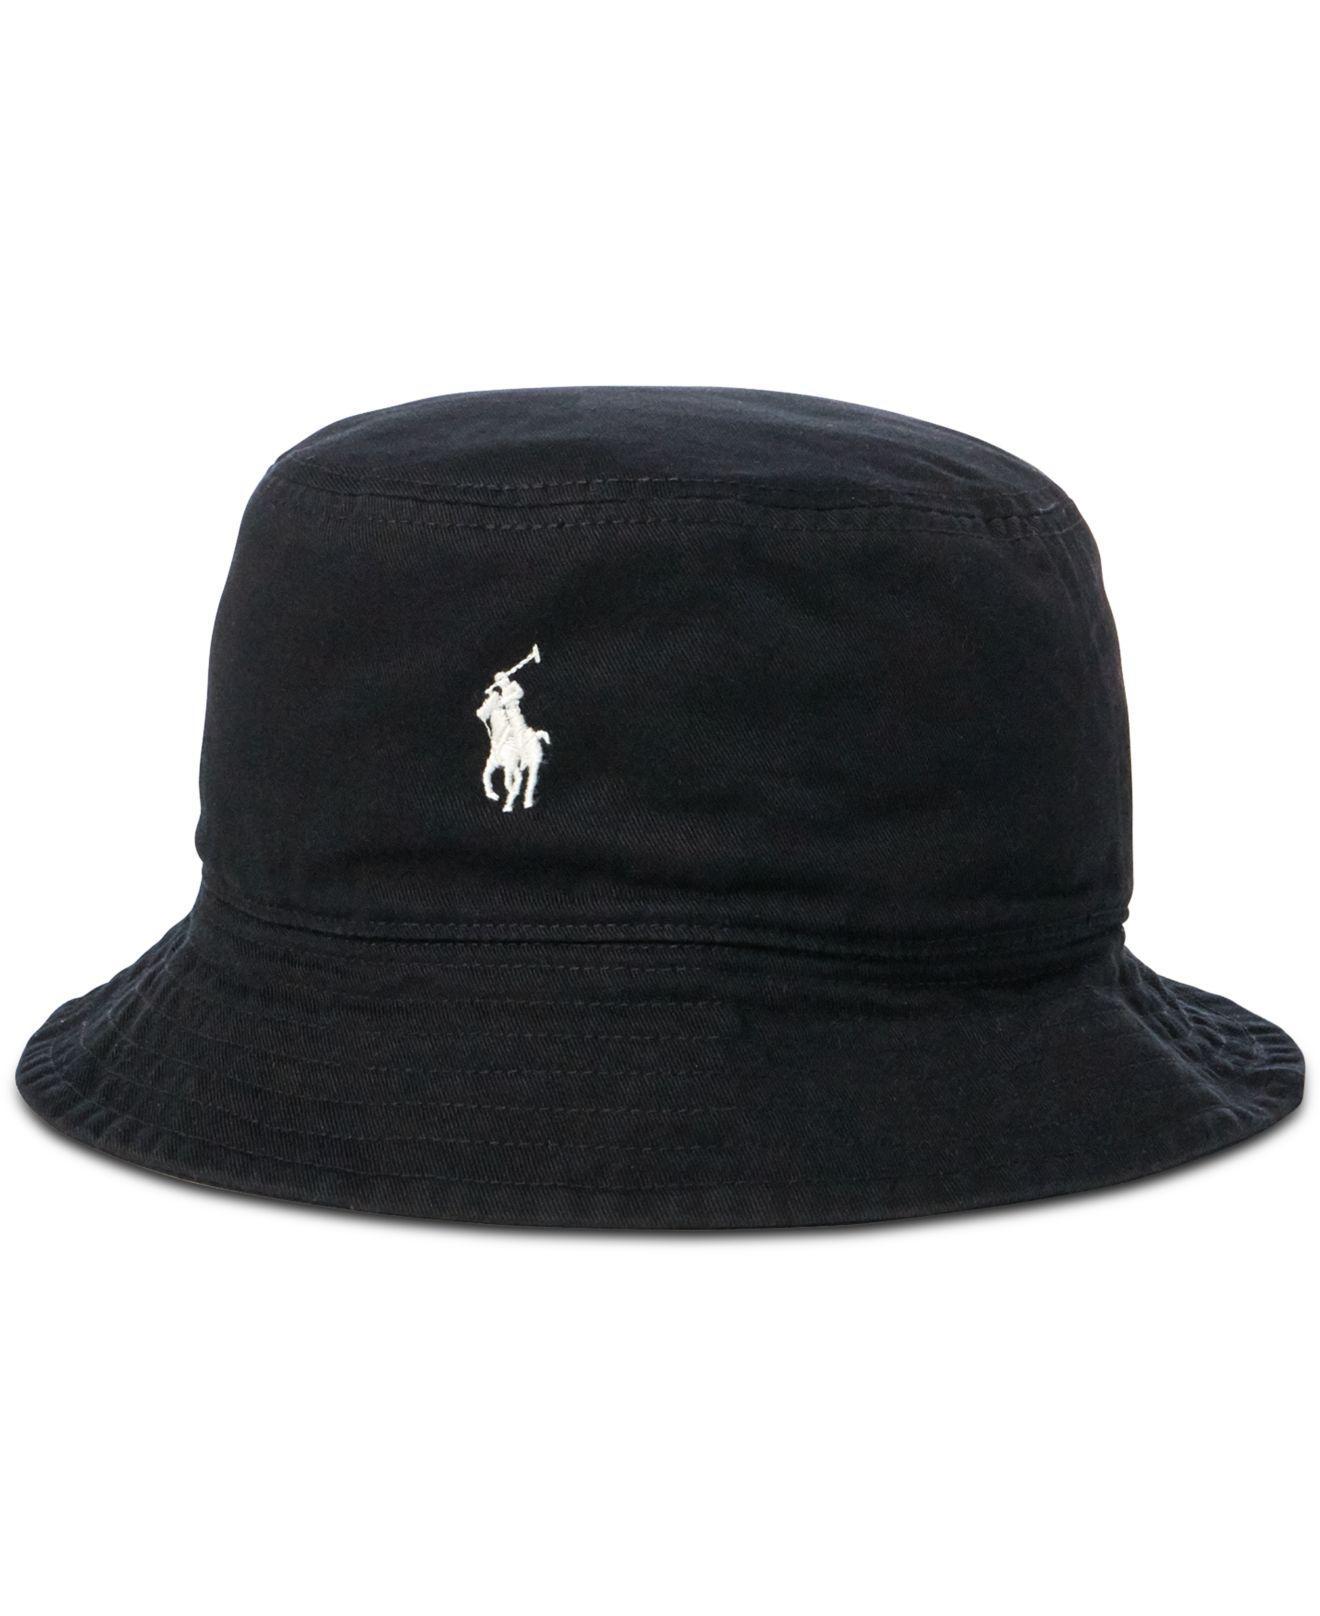 21ad35db016 Lyst - Polo Ralph Lauren Reversible Twill Bucket Hat in Black for Men